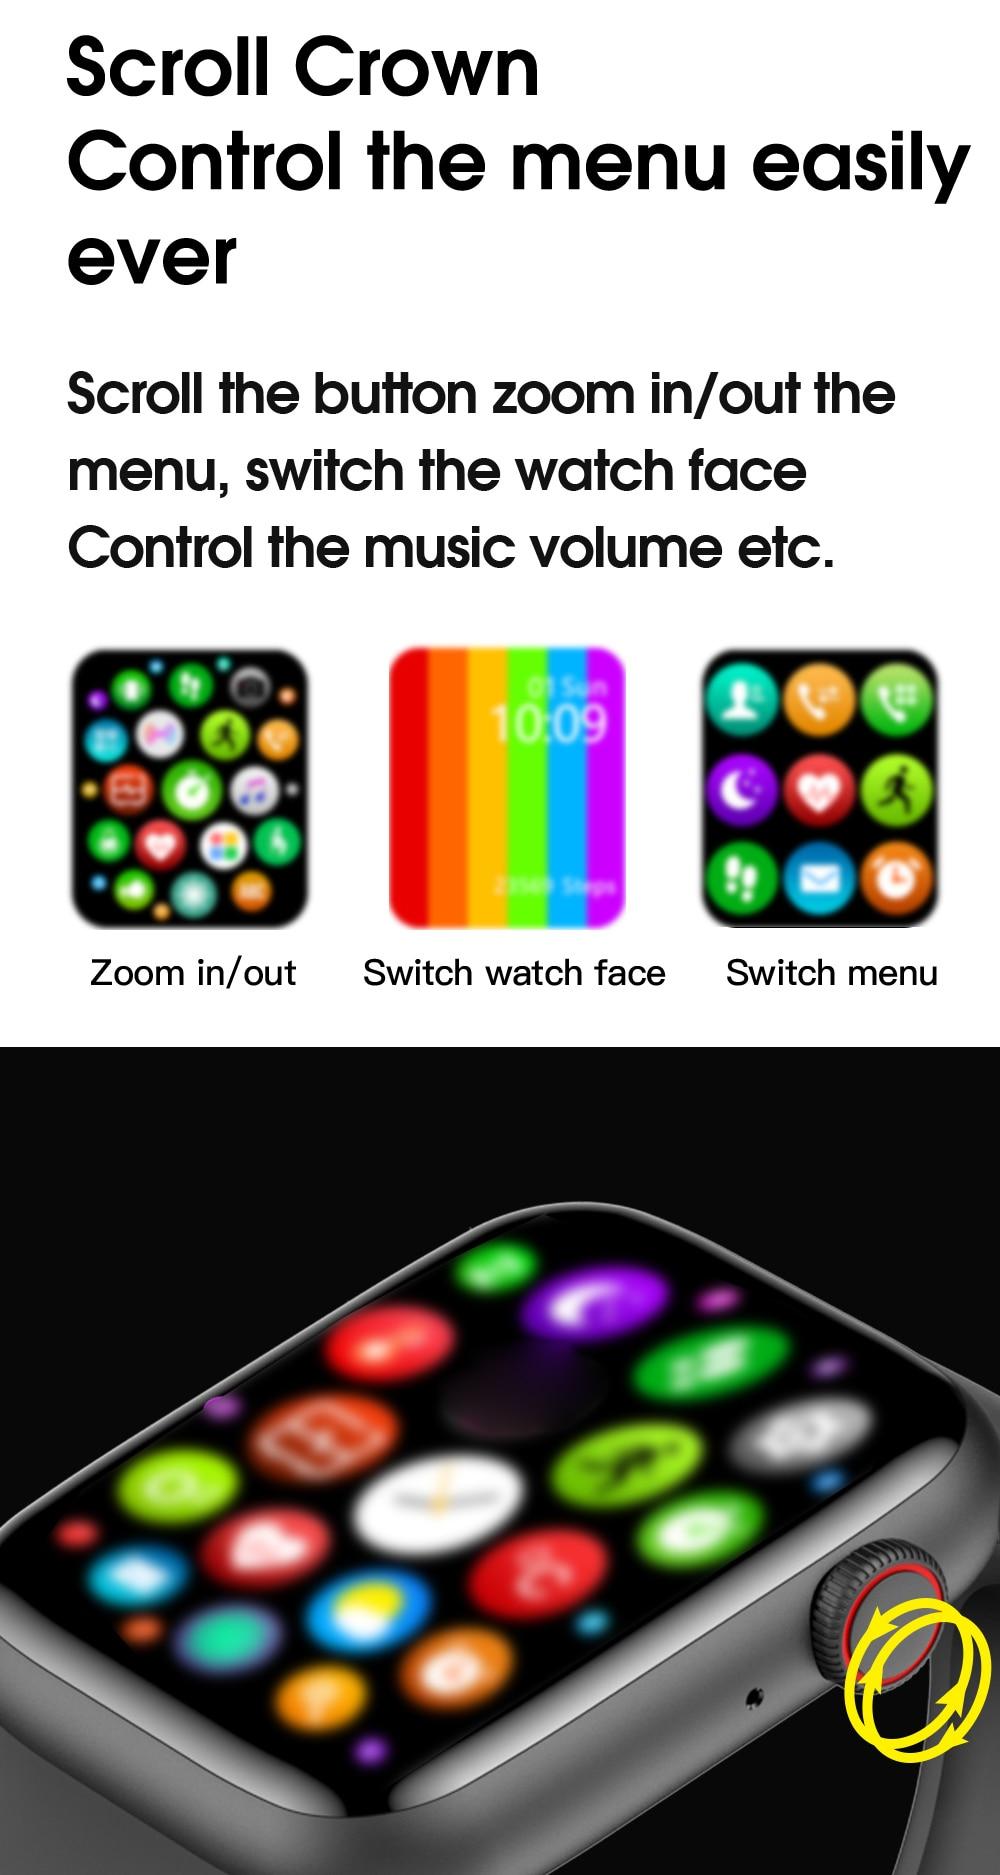 He8e29c0a158e4848a351be96728295349 TREZER IWO W26+ Pro Smart Watch 1.75 Inch 320*385 Series 6 IPS Full Touch Screen Custom Watch Face Smartwatch Men Women PK HW22